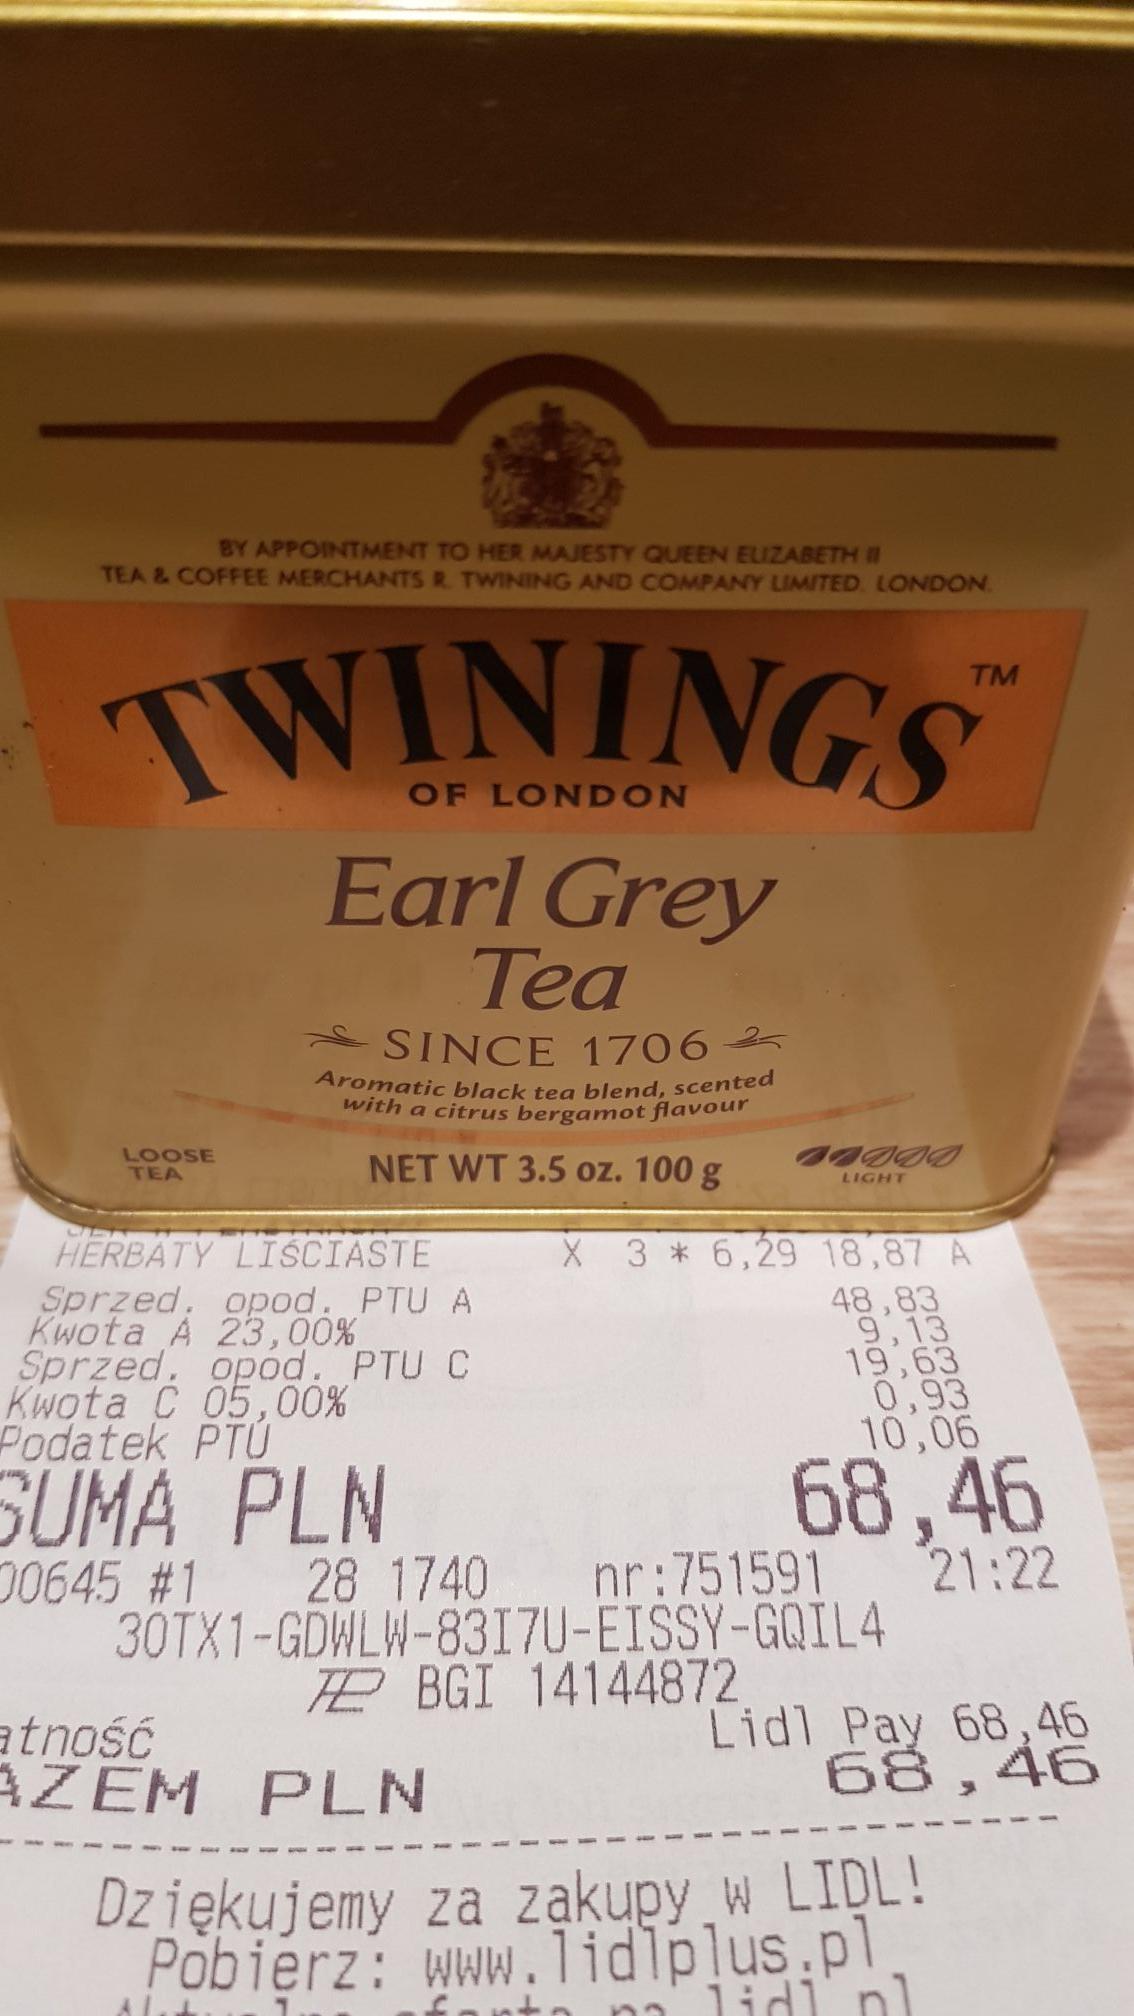 Herbata liściasta Twinings Earl Grey - Lidl